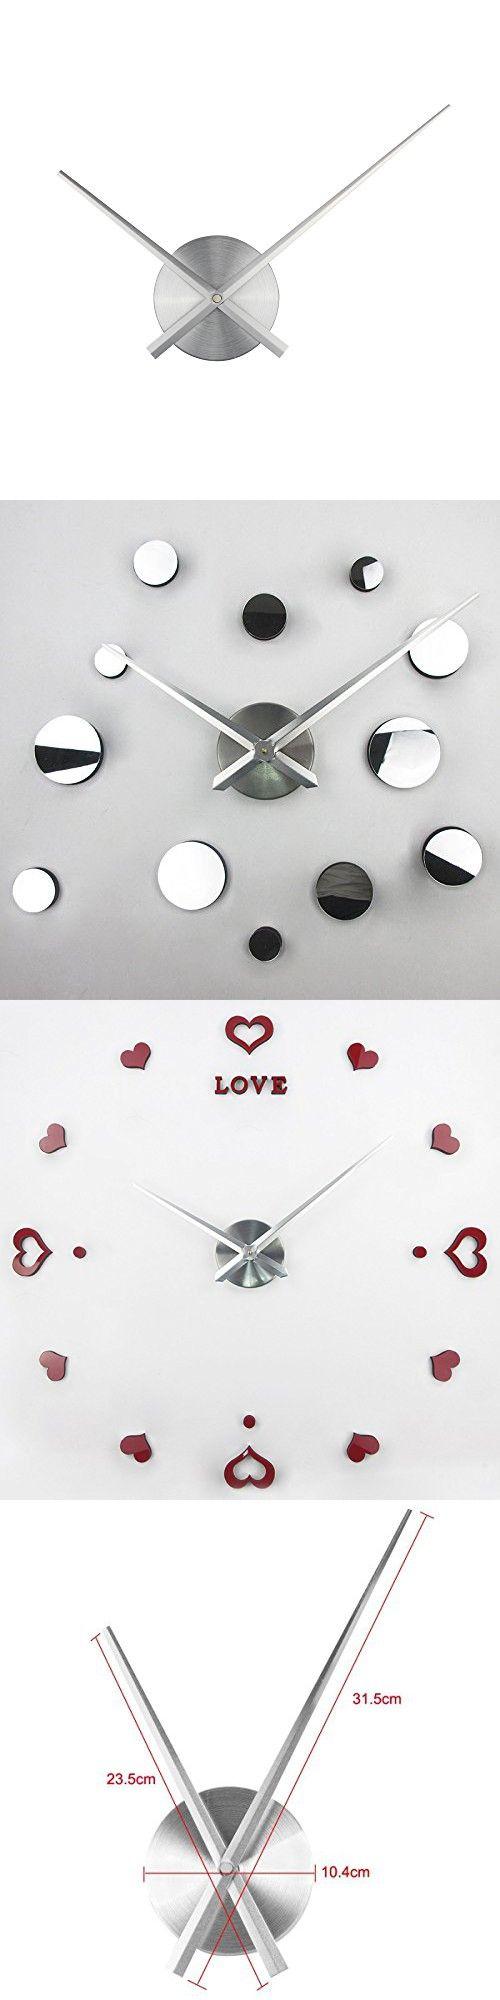 The 25 best large decorative wall clocks ideas on pinterest big 3d clock hands timelike diy large clock hands needles wall clocks 3d home art decor amipublicfo Images